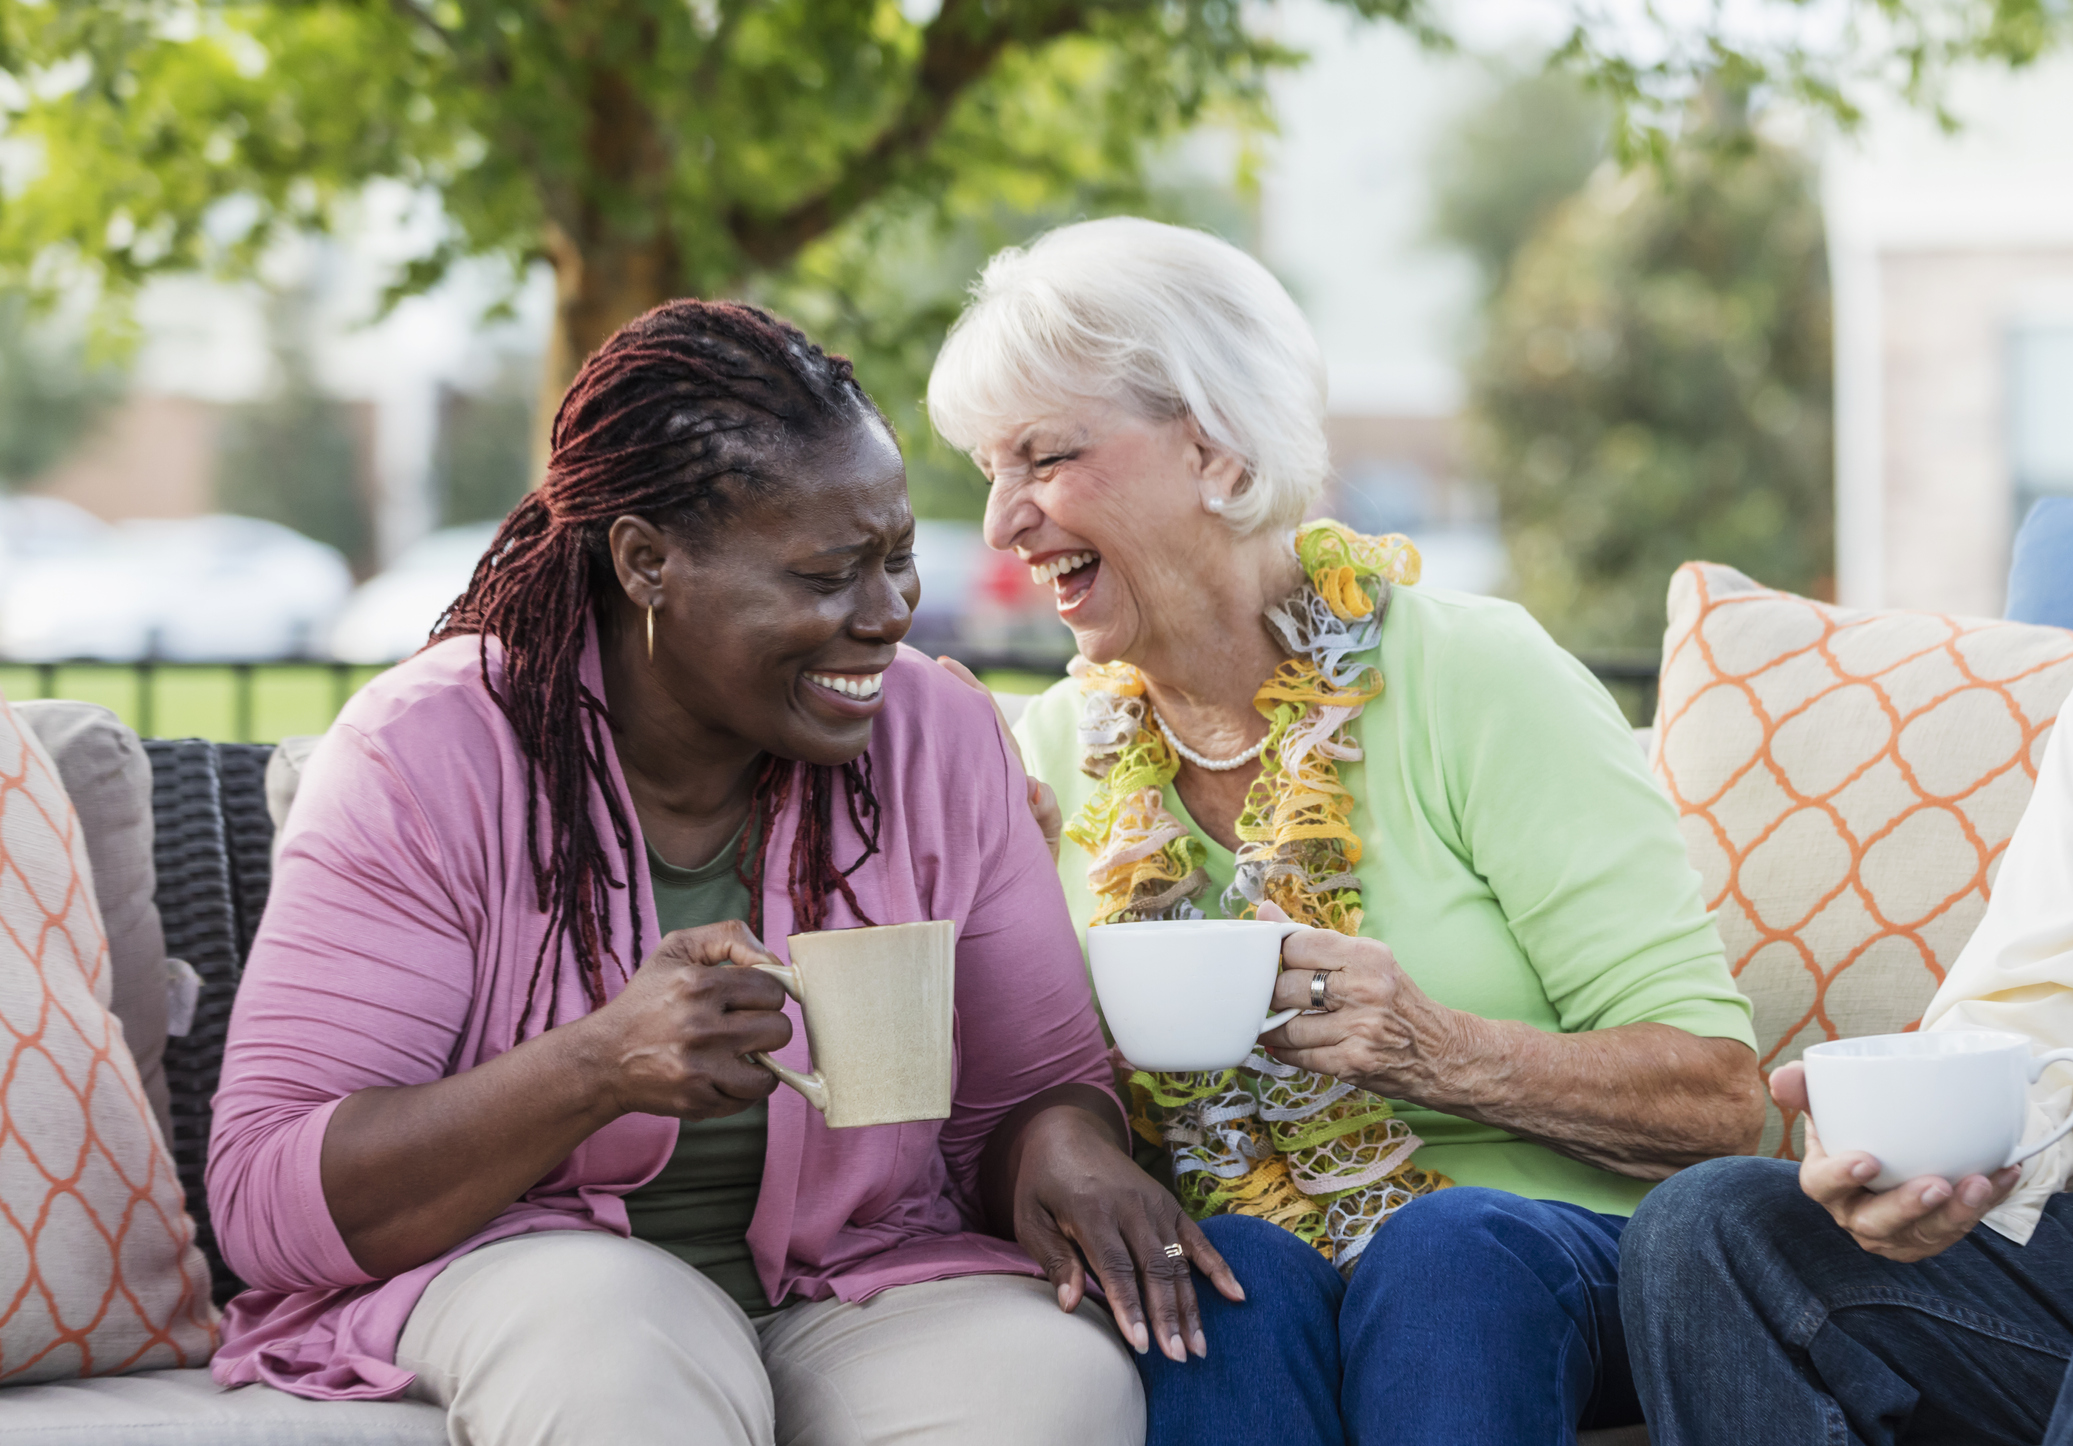 Image of next post - 5 WAYS TO DECREASE SENIOR LONELINESS